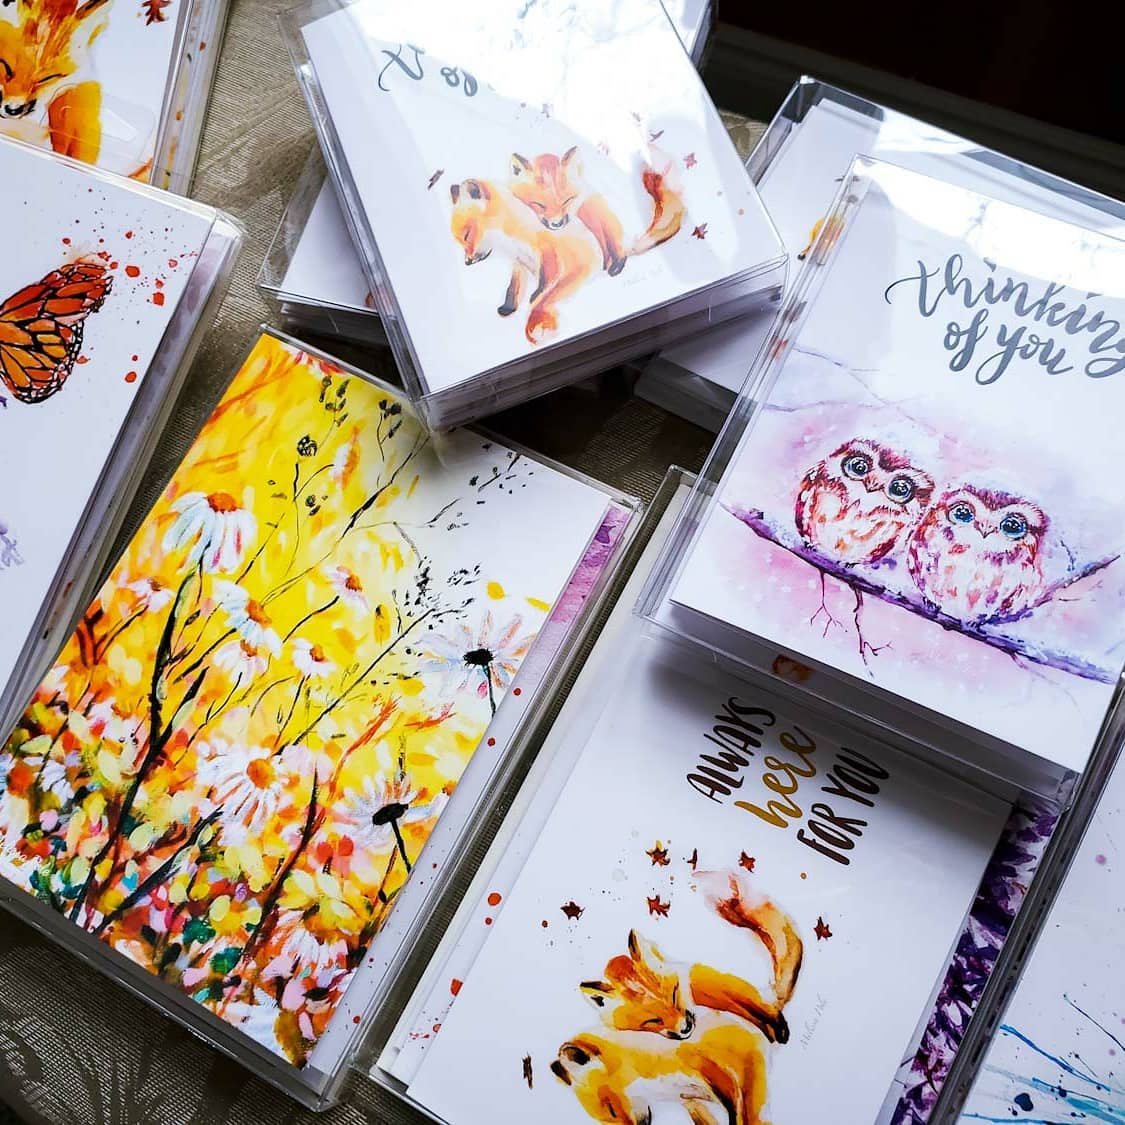 Cards, art cards, Muskoka artwork, muskoka, muskoka artist, original artwork, blank cards, shop local